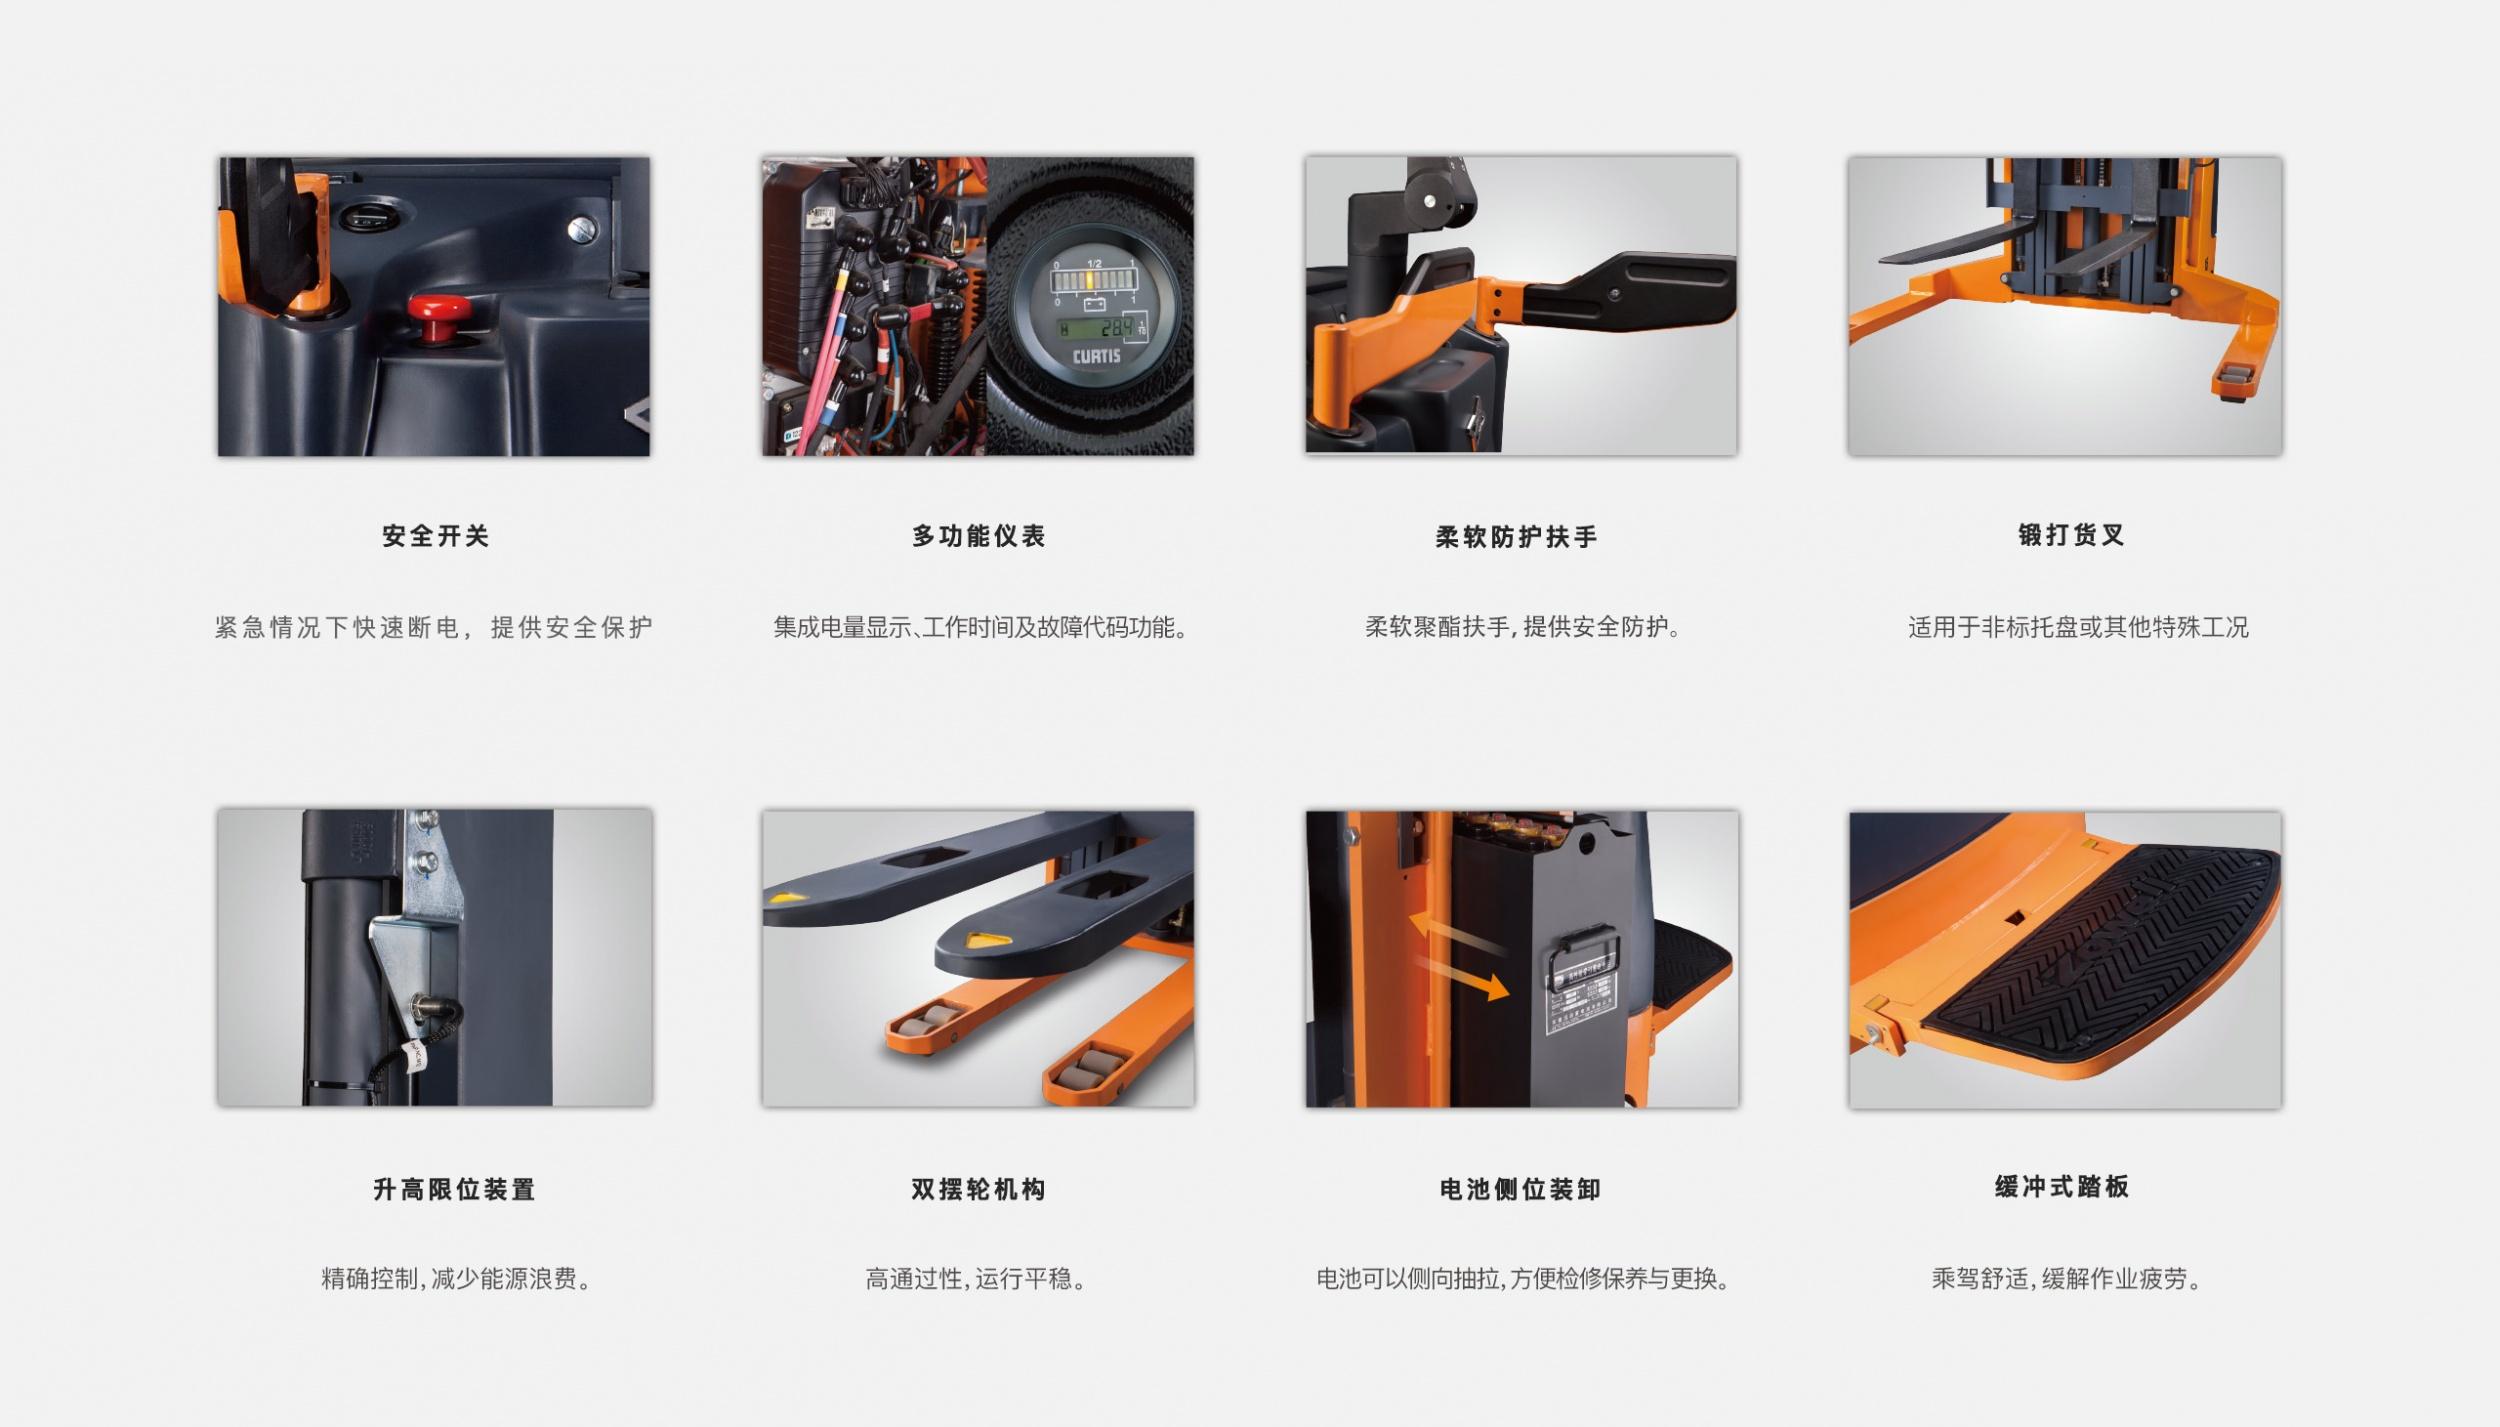 XEK电动托盘堆垛车局部图